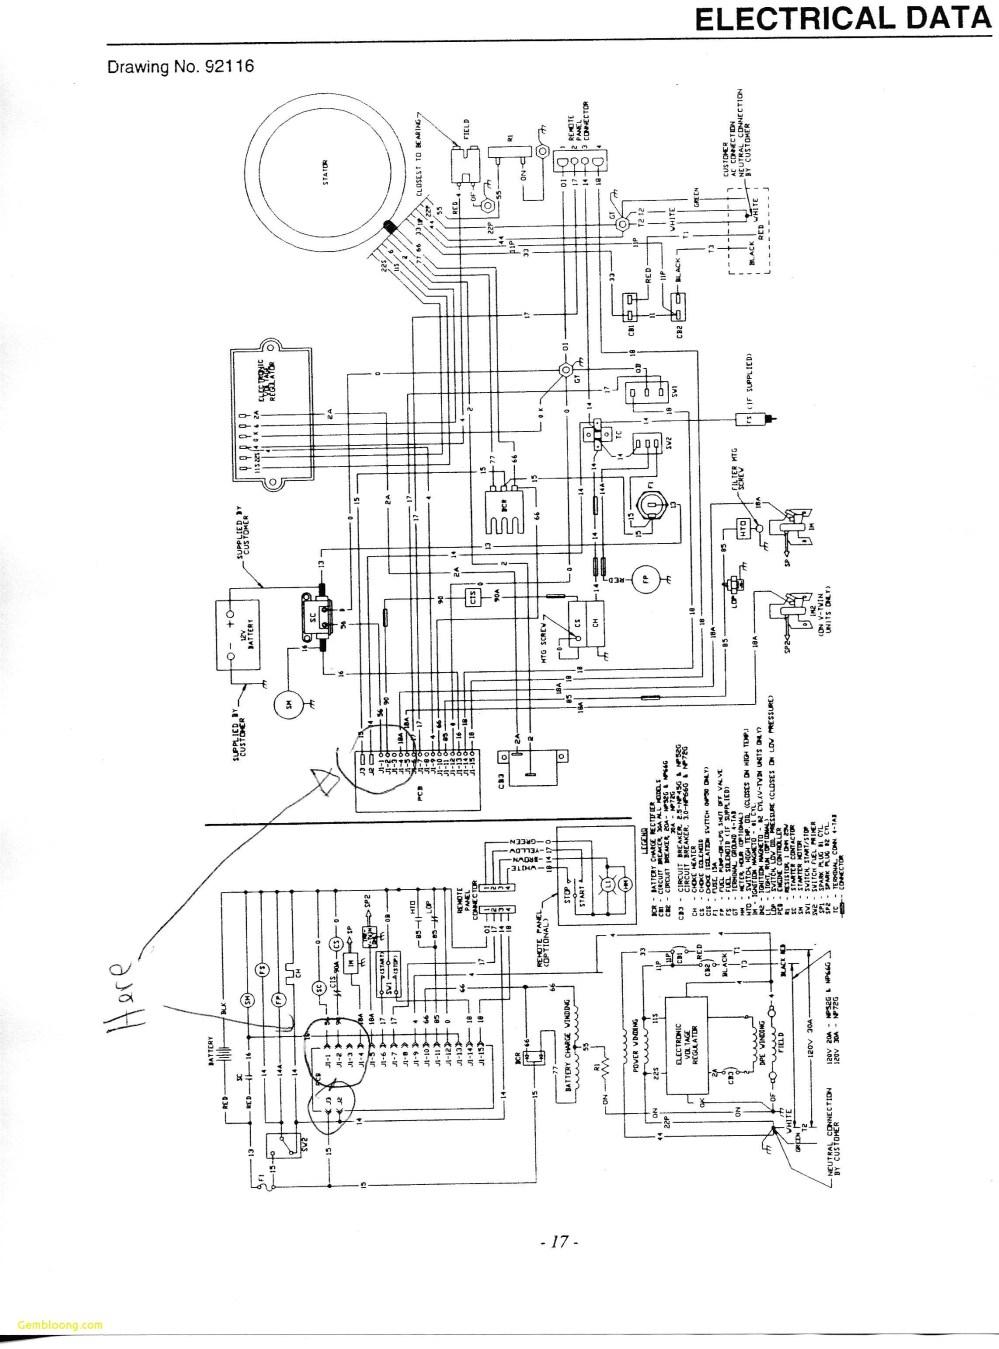 medium resolution of olympian generator wiring diagram 4001e download olympian generator wiring diagram wiring library 17 i download wiring diagram